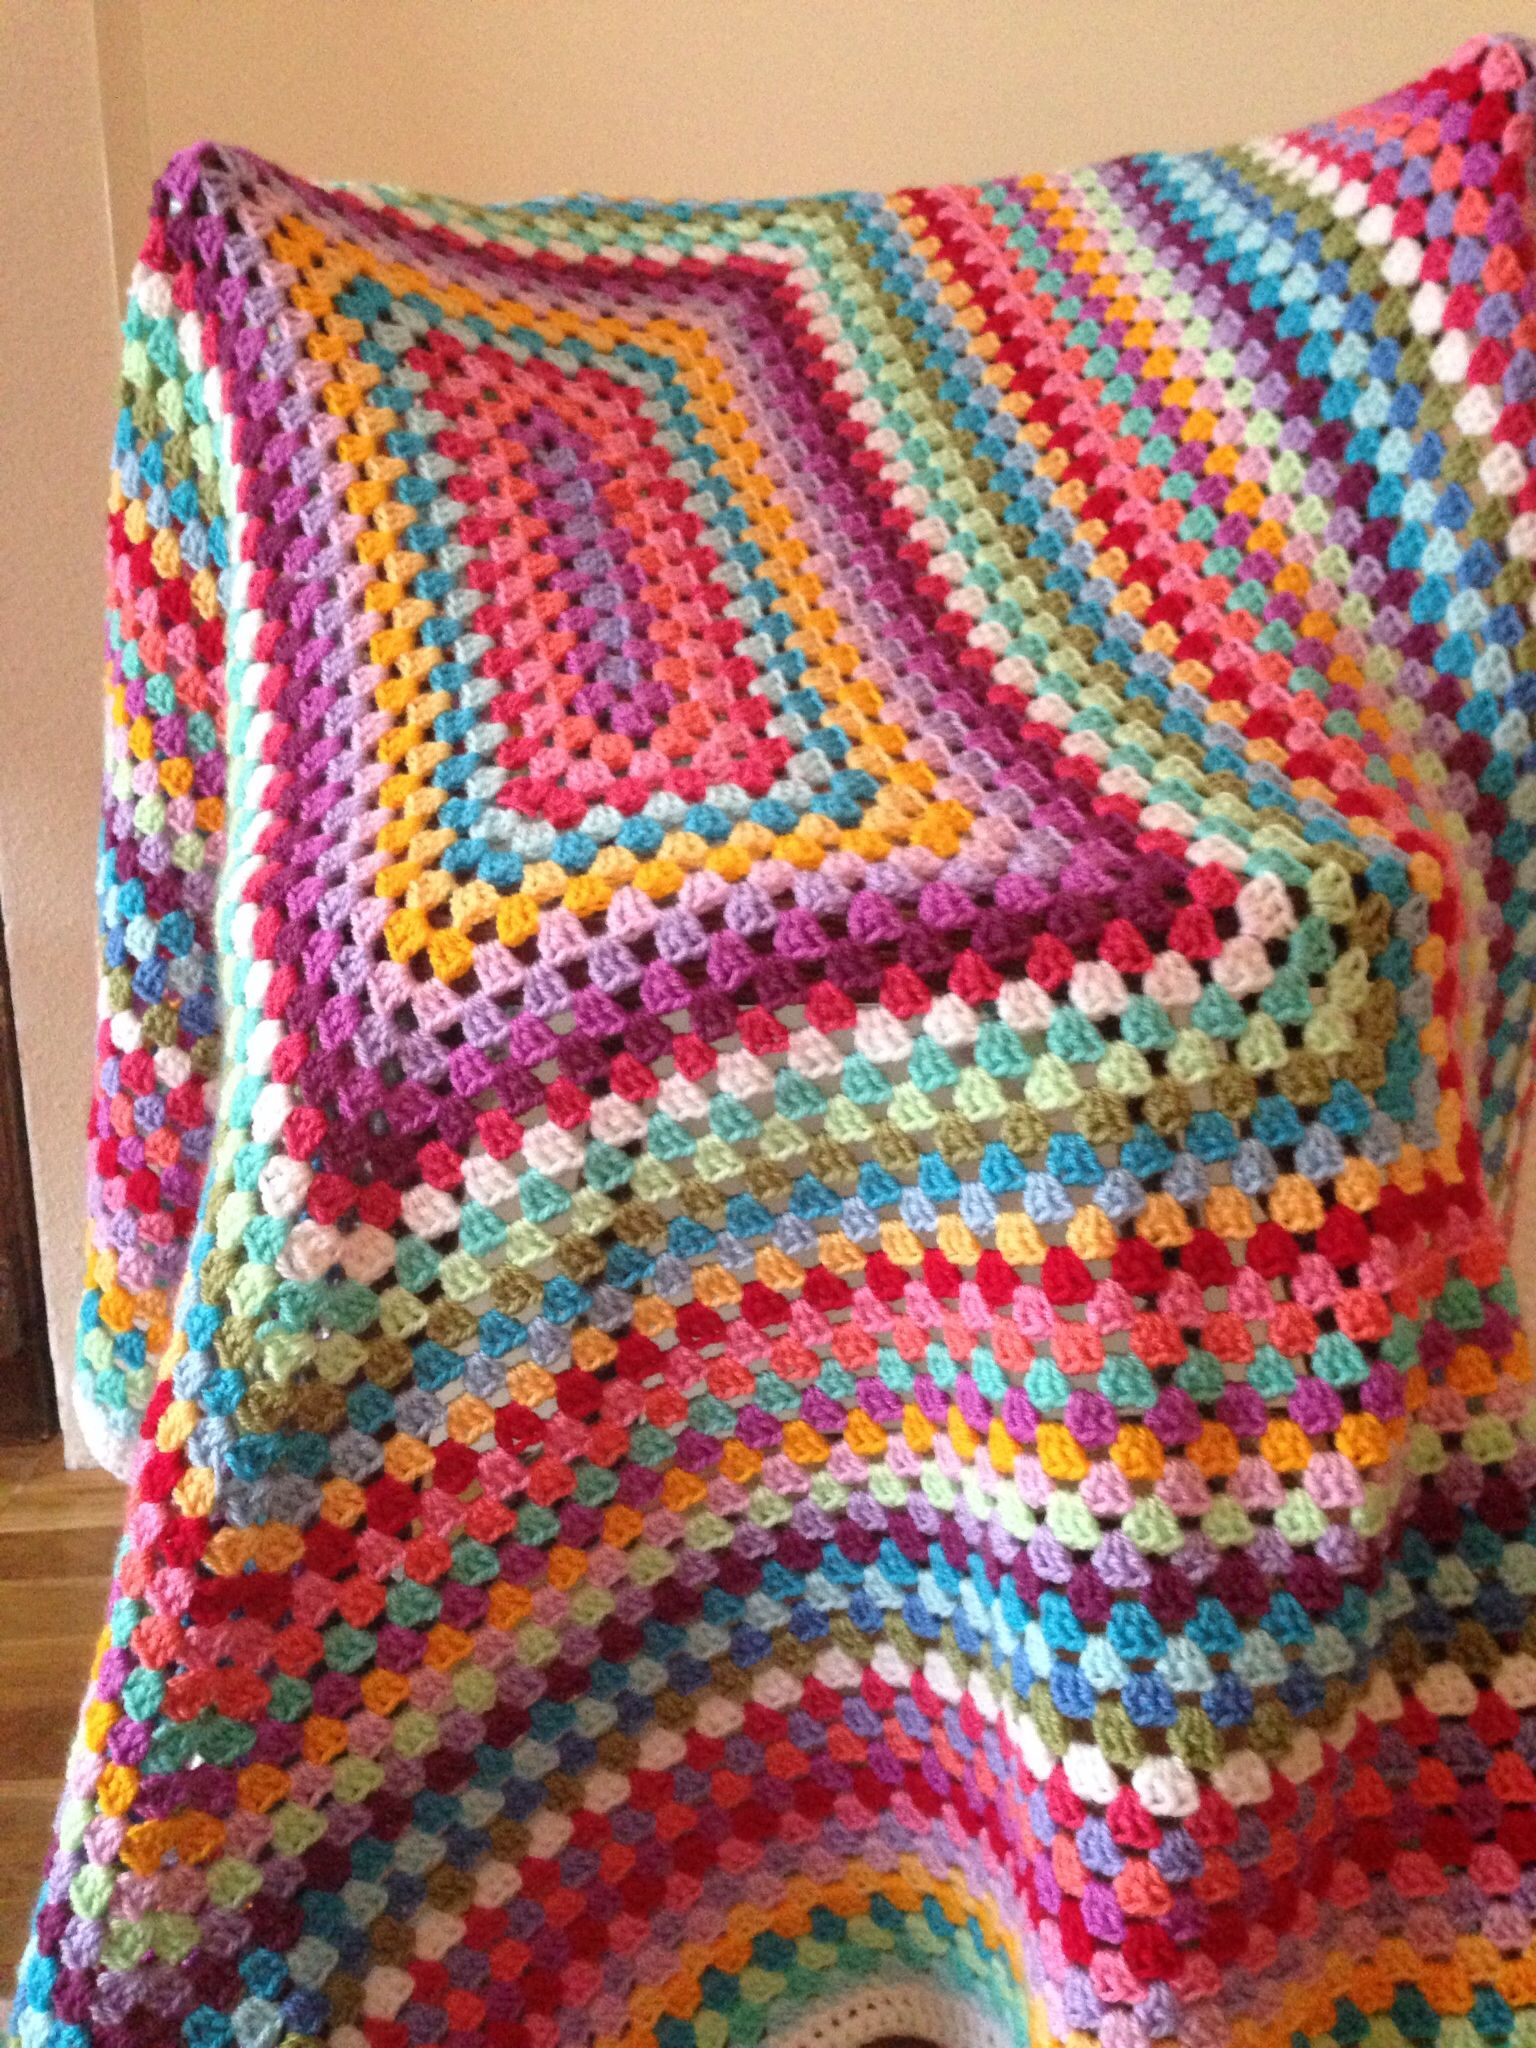 Crocheting Blankets : Crochet blanket Crochet pattern Pinterest